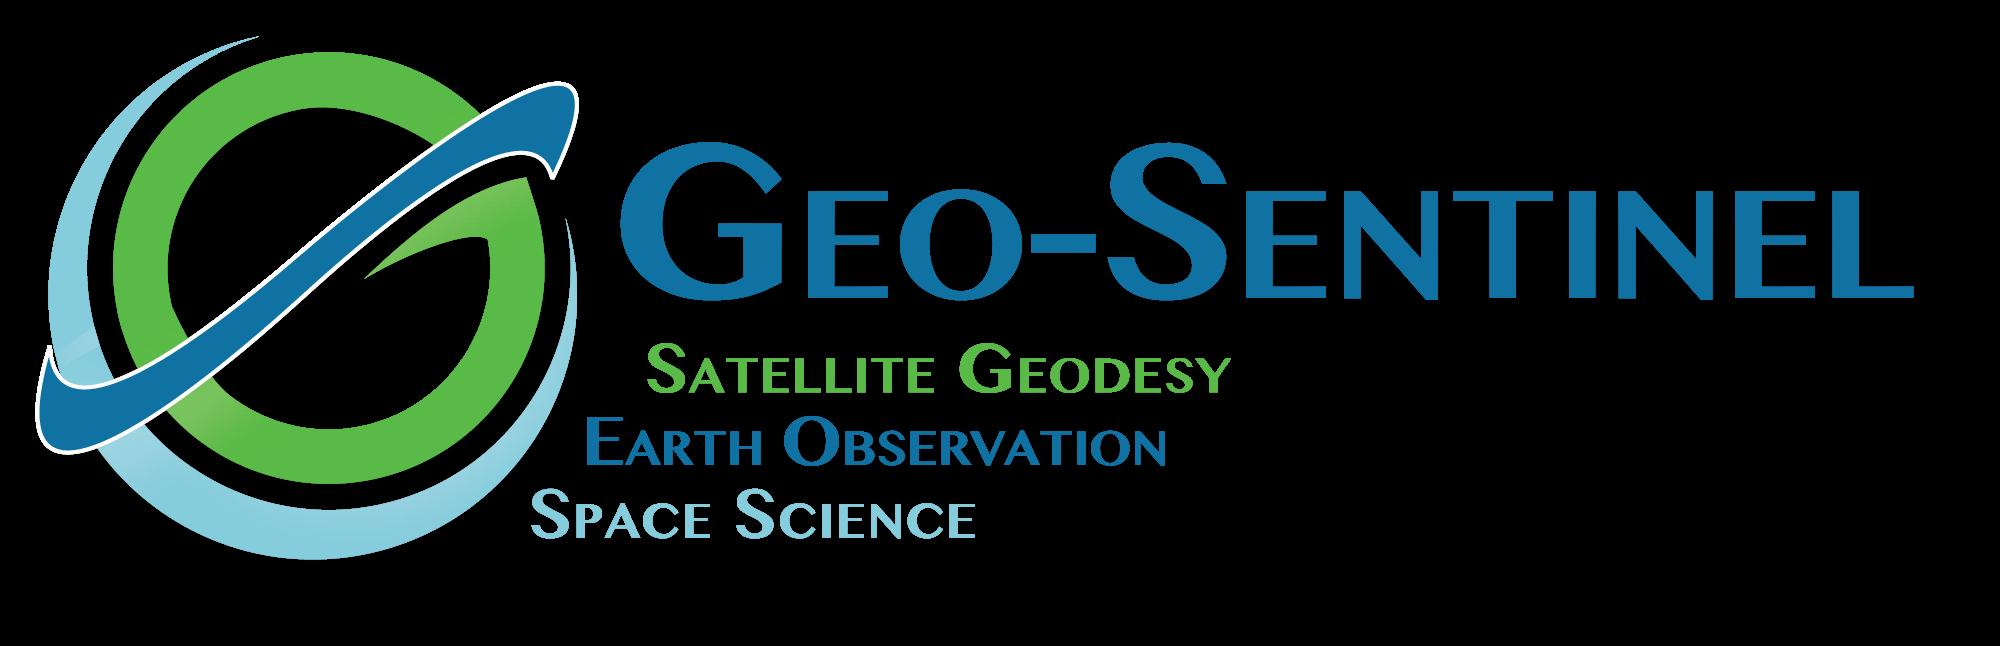 Geo-Sentinel